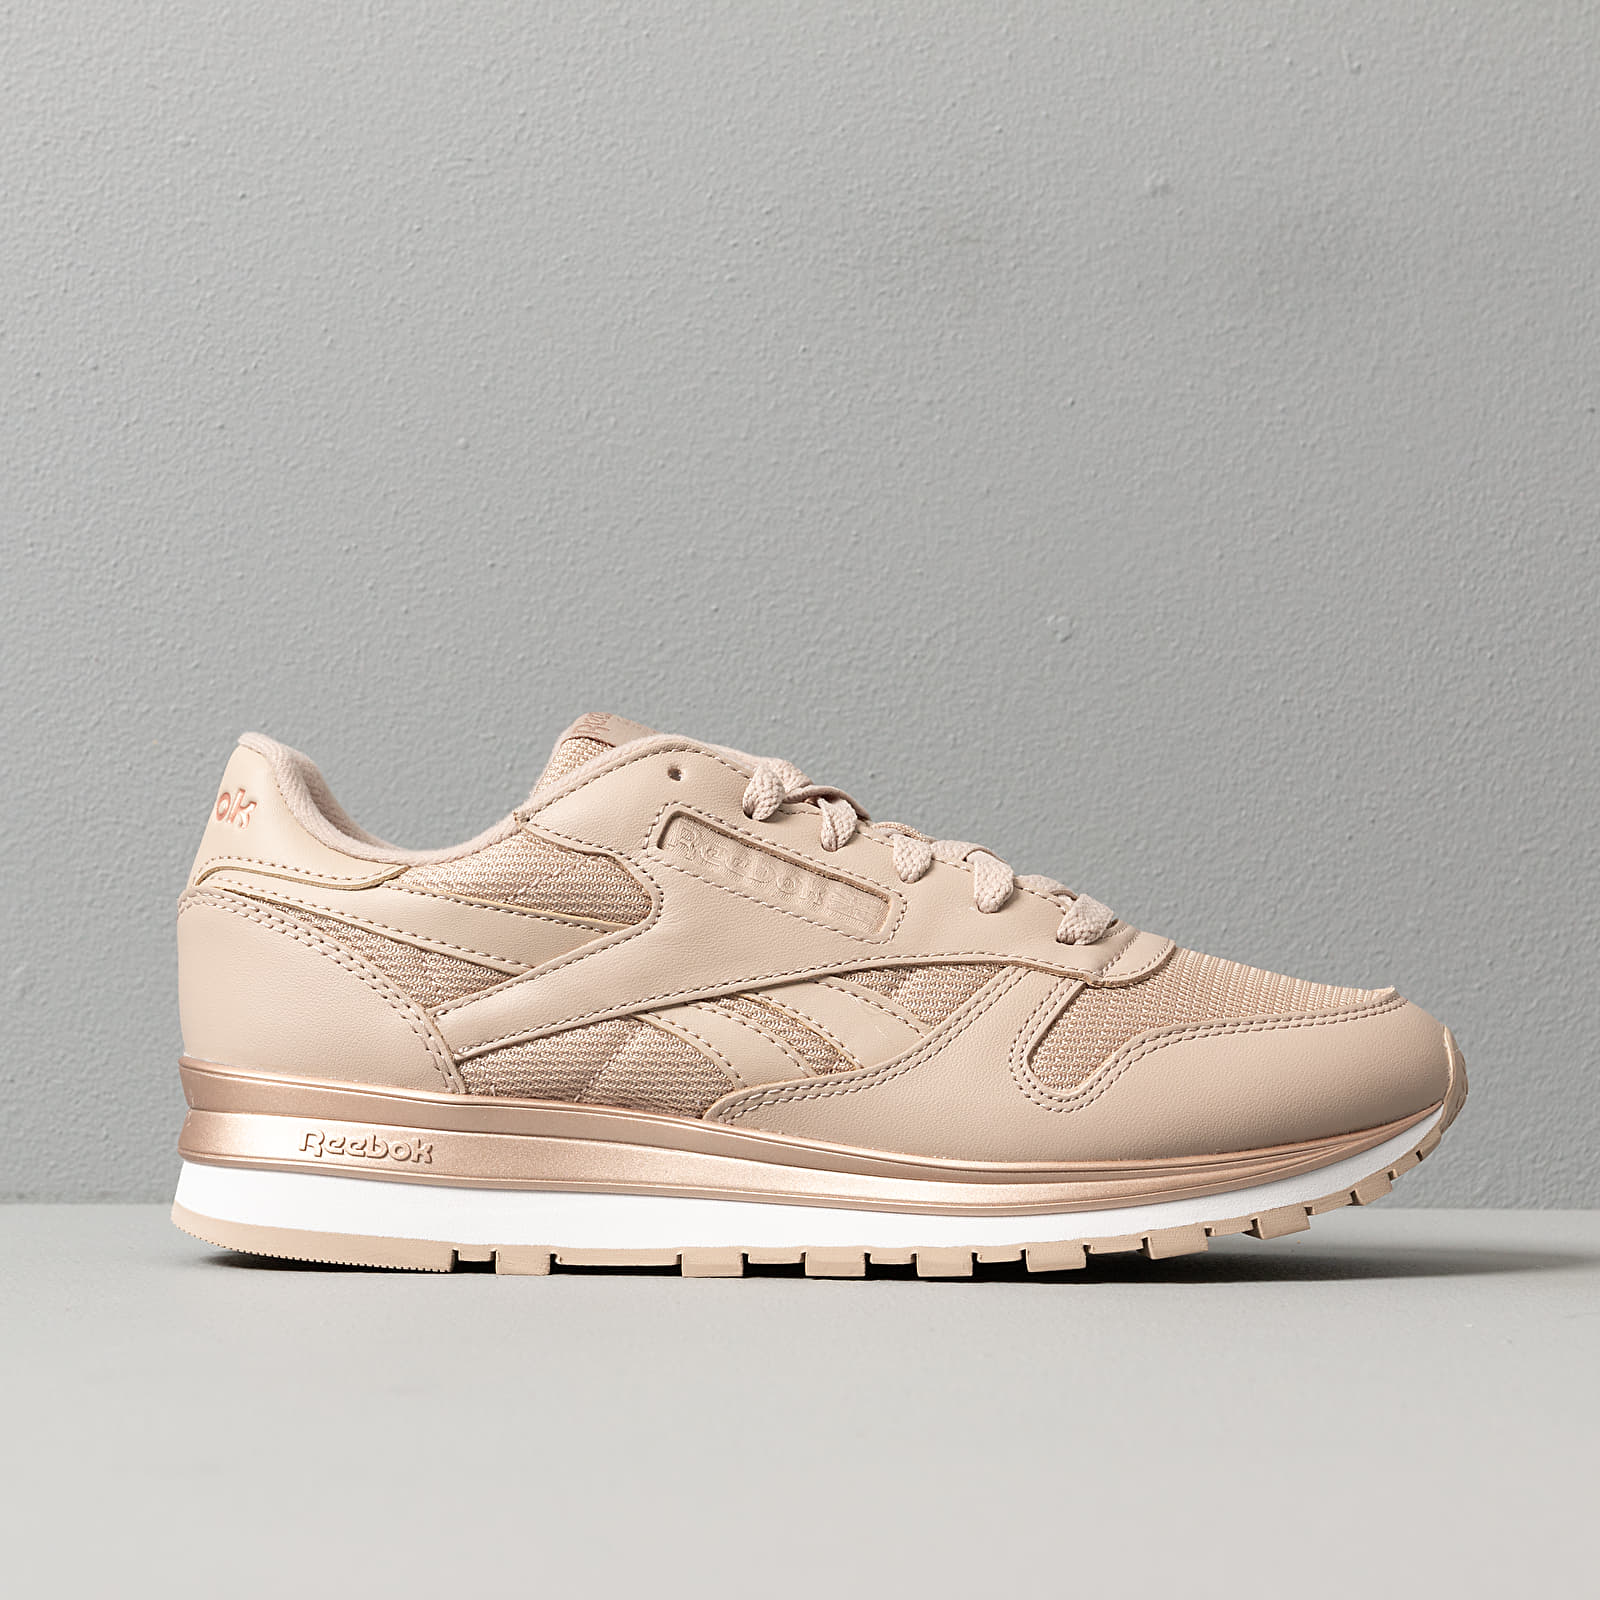 Construir sobre Miguel Ángel Actriz  Women's shoes Reebok Classic Leather Modern Beige/ Rose Gold/ White